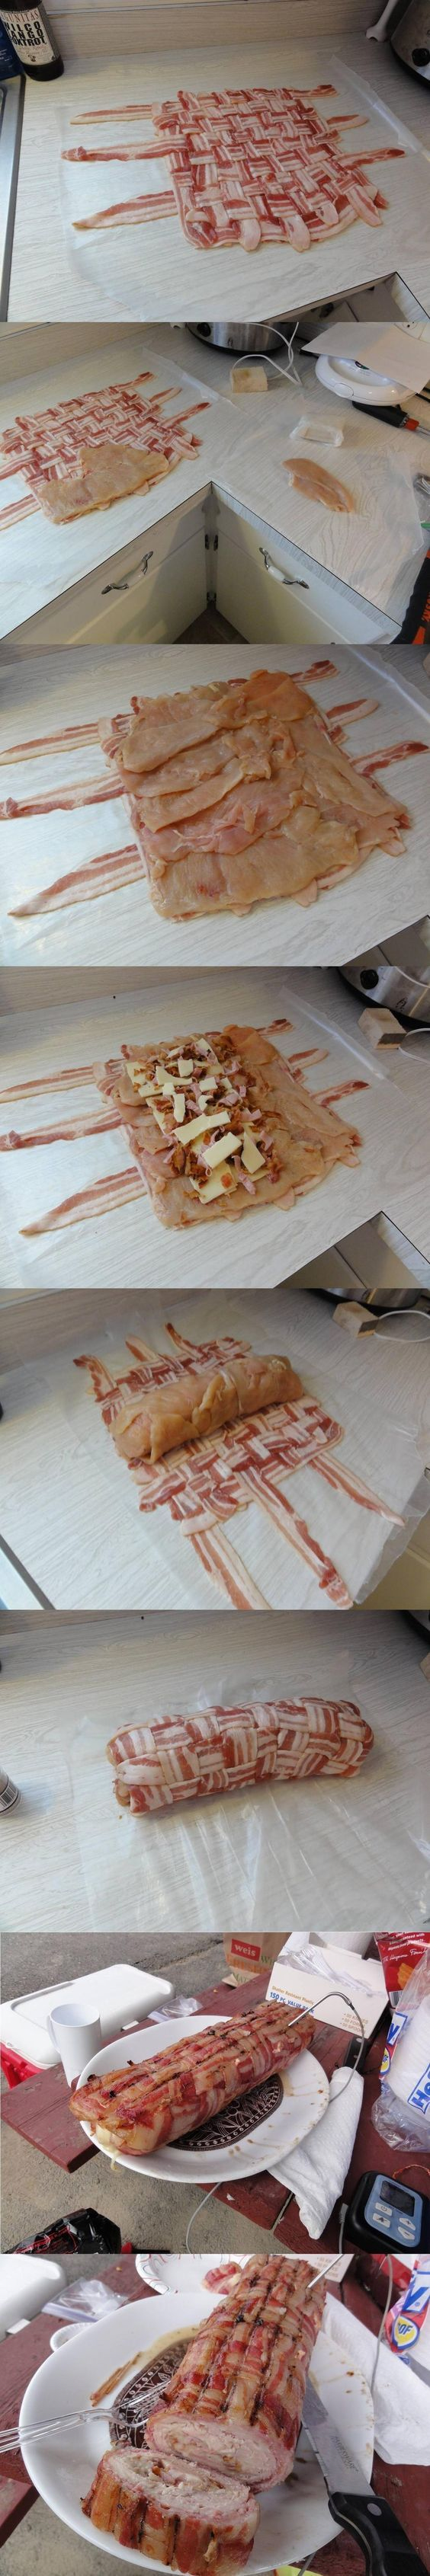 Chicken/Bacon Bomb!!: